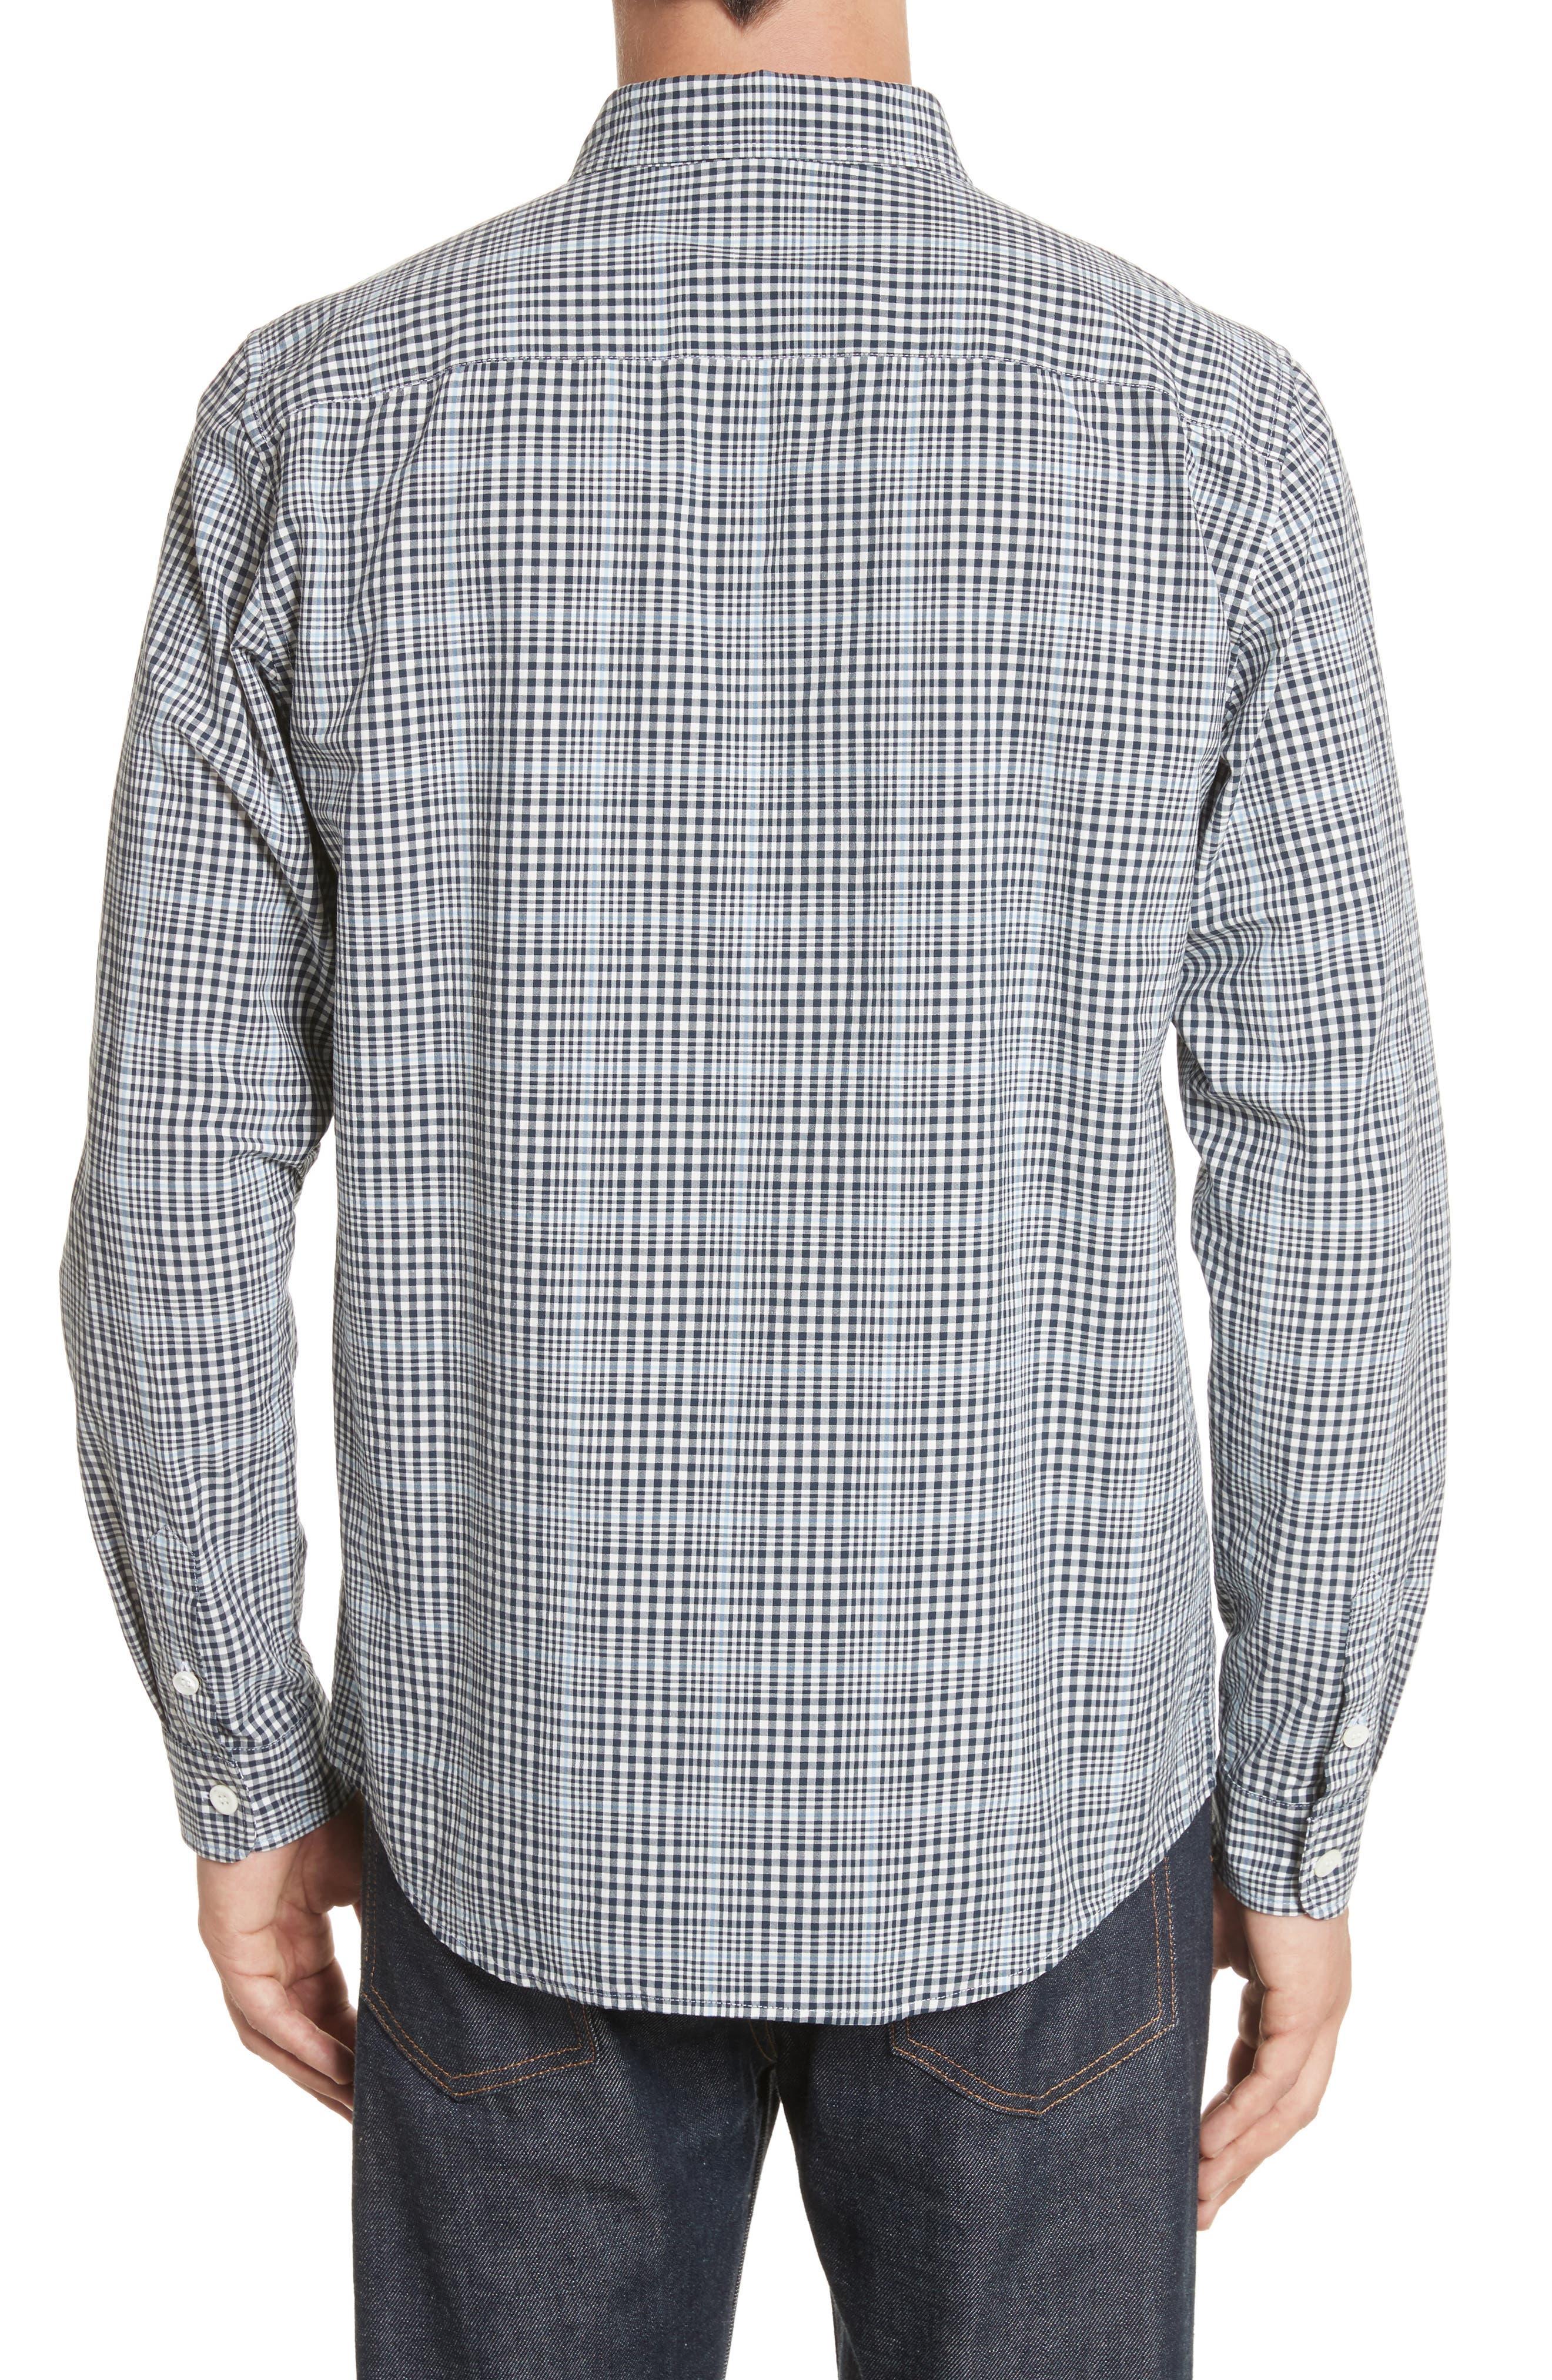 John Check Woven Shirt,                             Alternate thumbnail 2, color,                             410